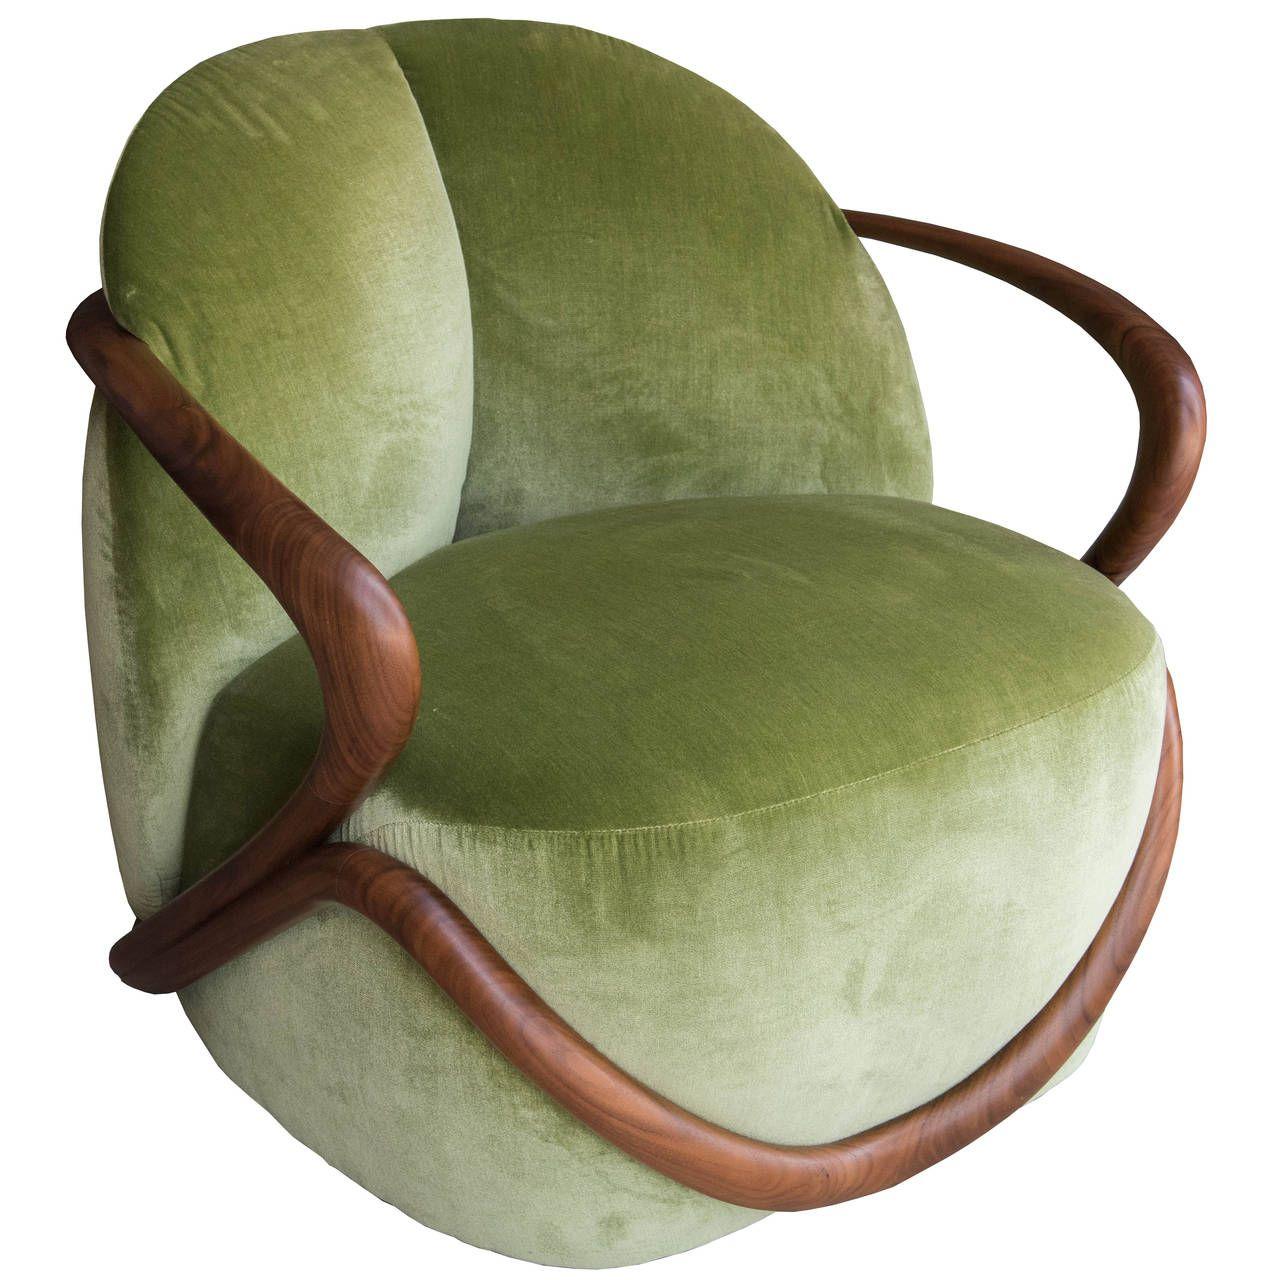 Hug Armchair Armchairs, Modern and Steel